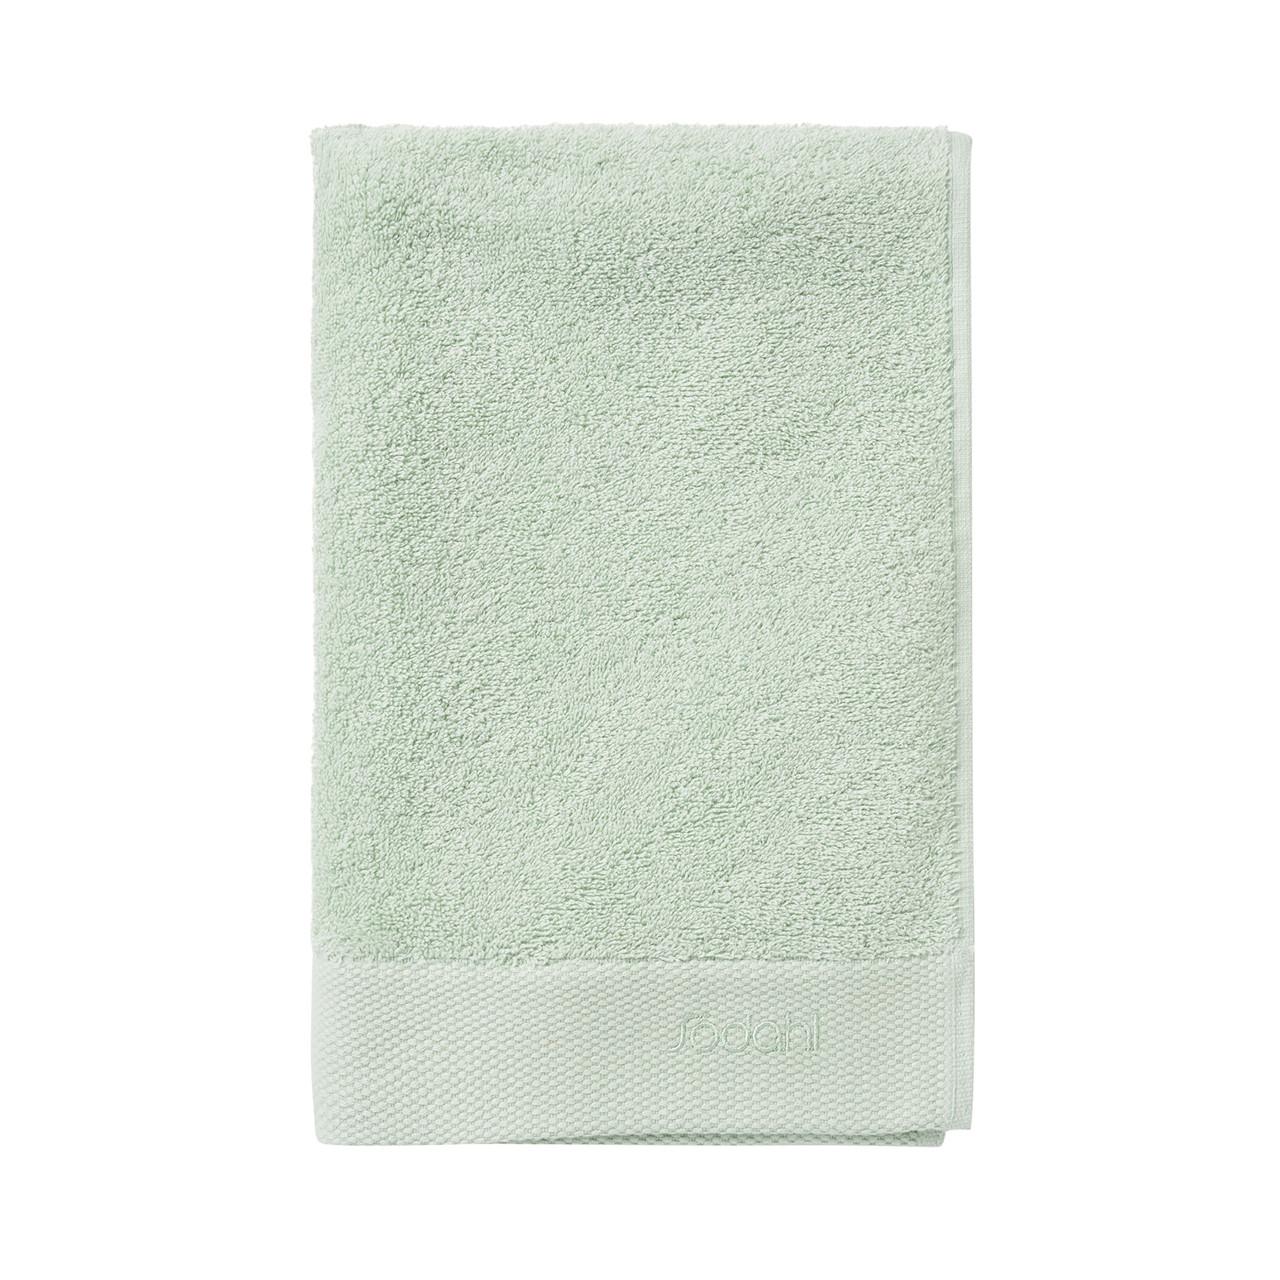 SÖDAHL Håndklæde 70x140 Comfort mint